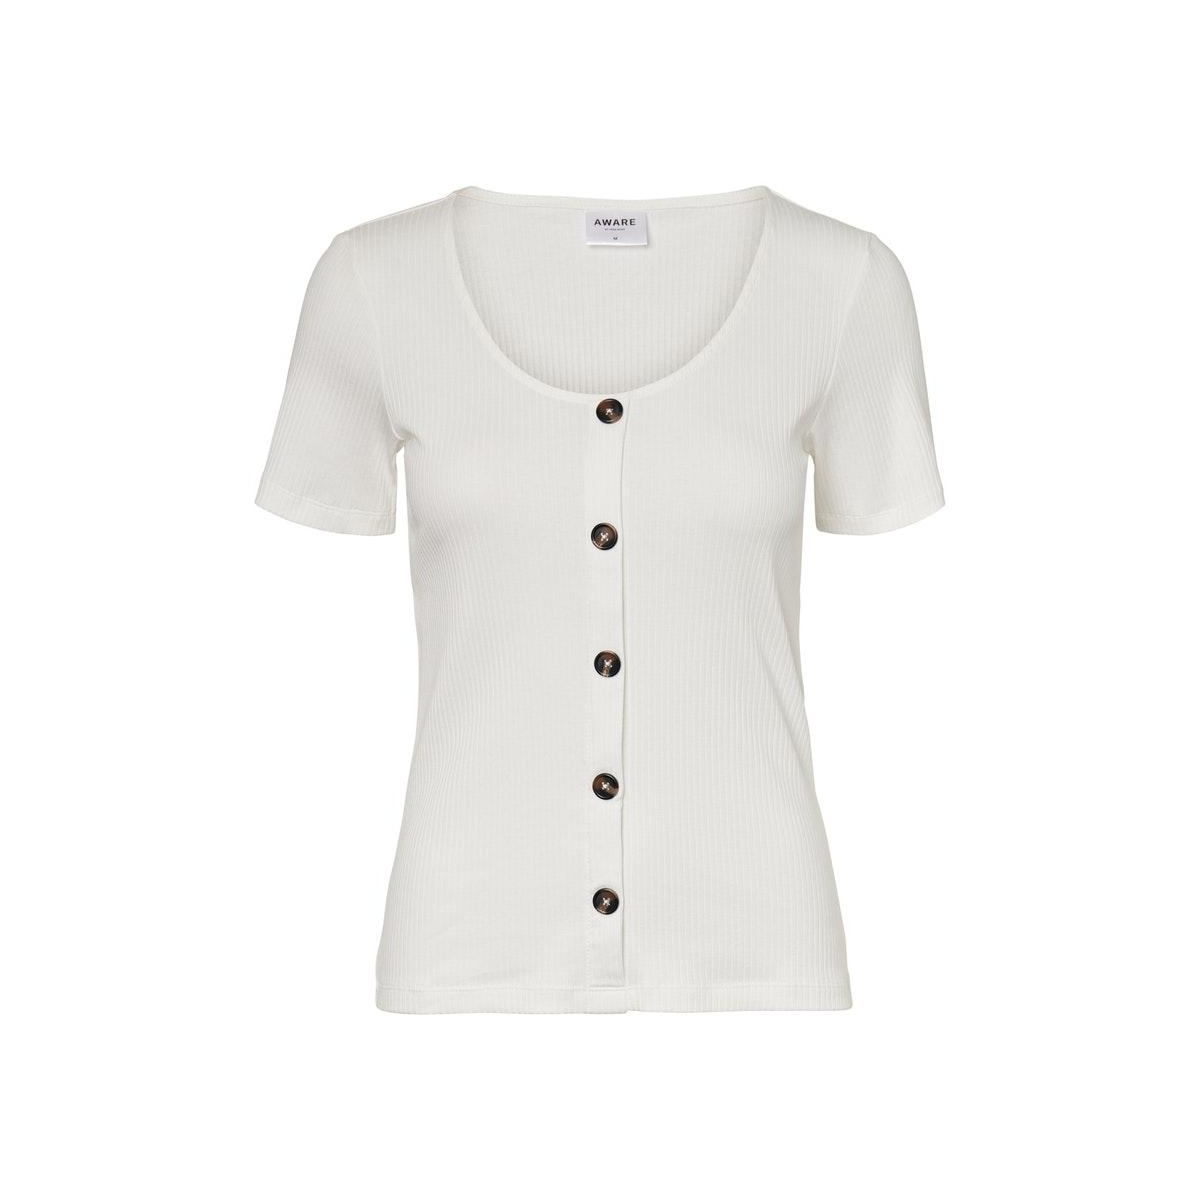 vmhelsinki ss top ga noos 10229727 vero moda t-shirt snow white